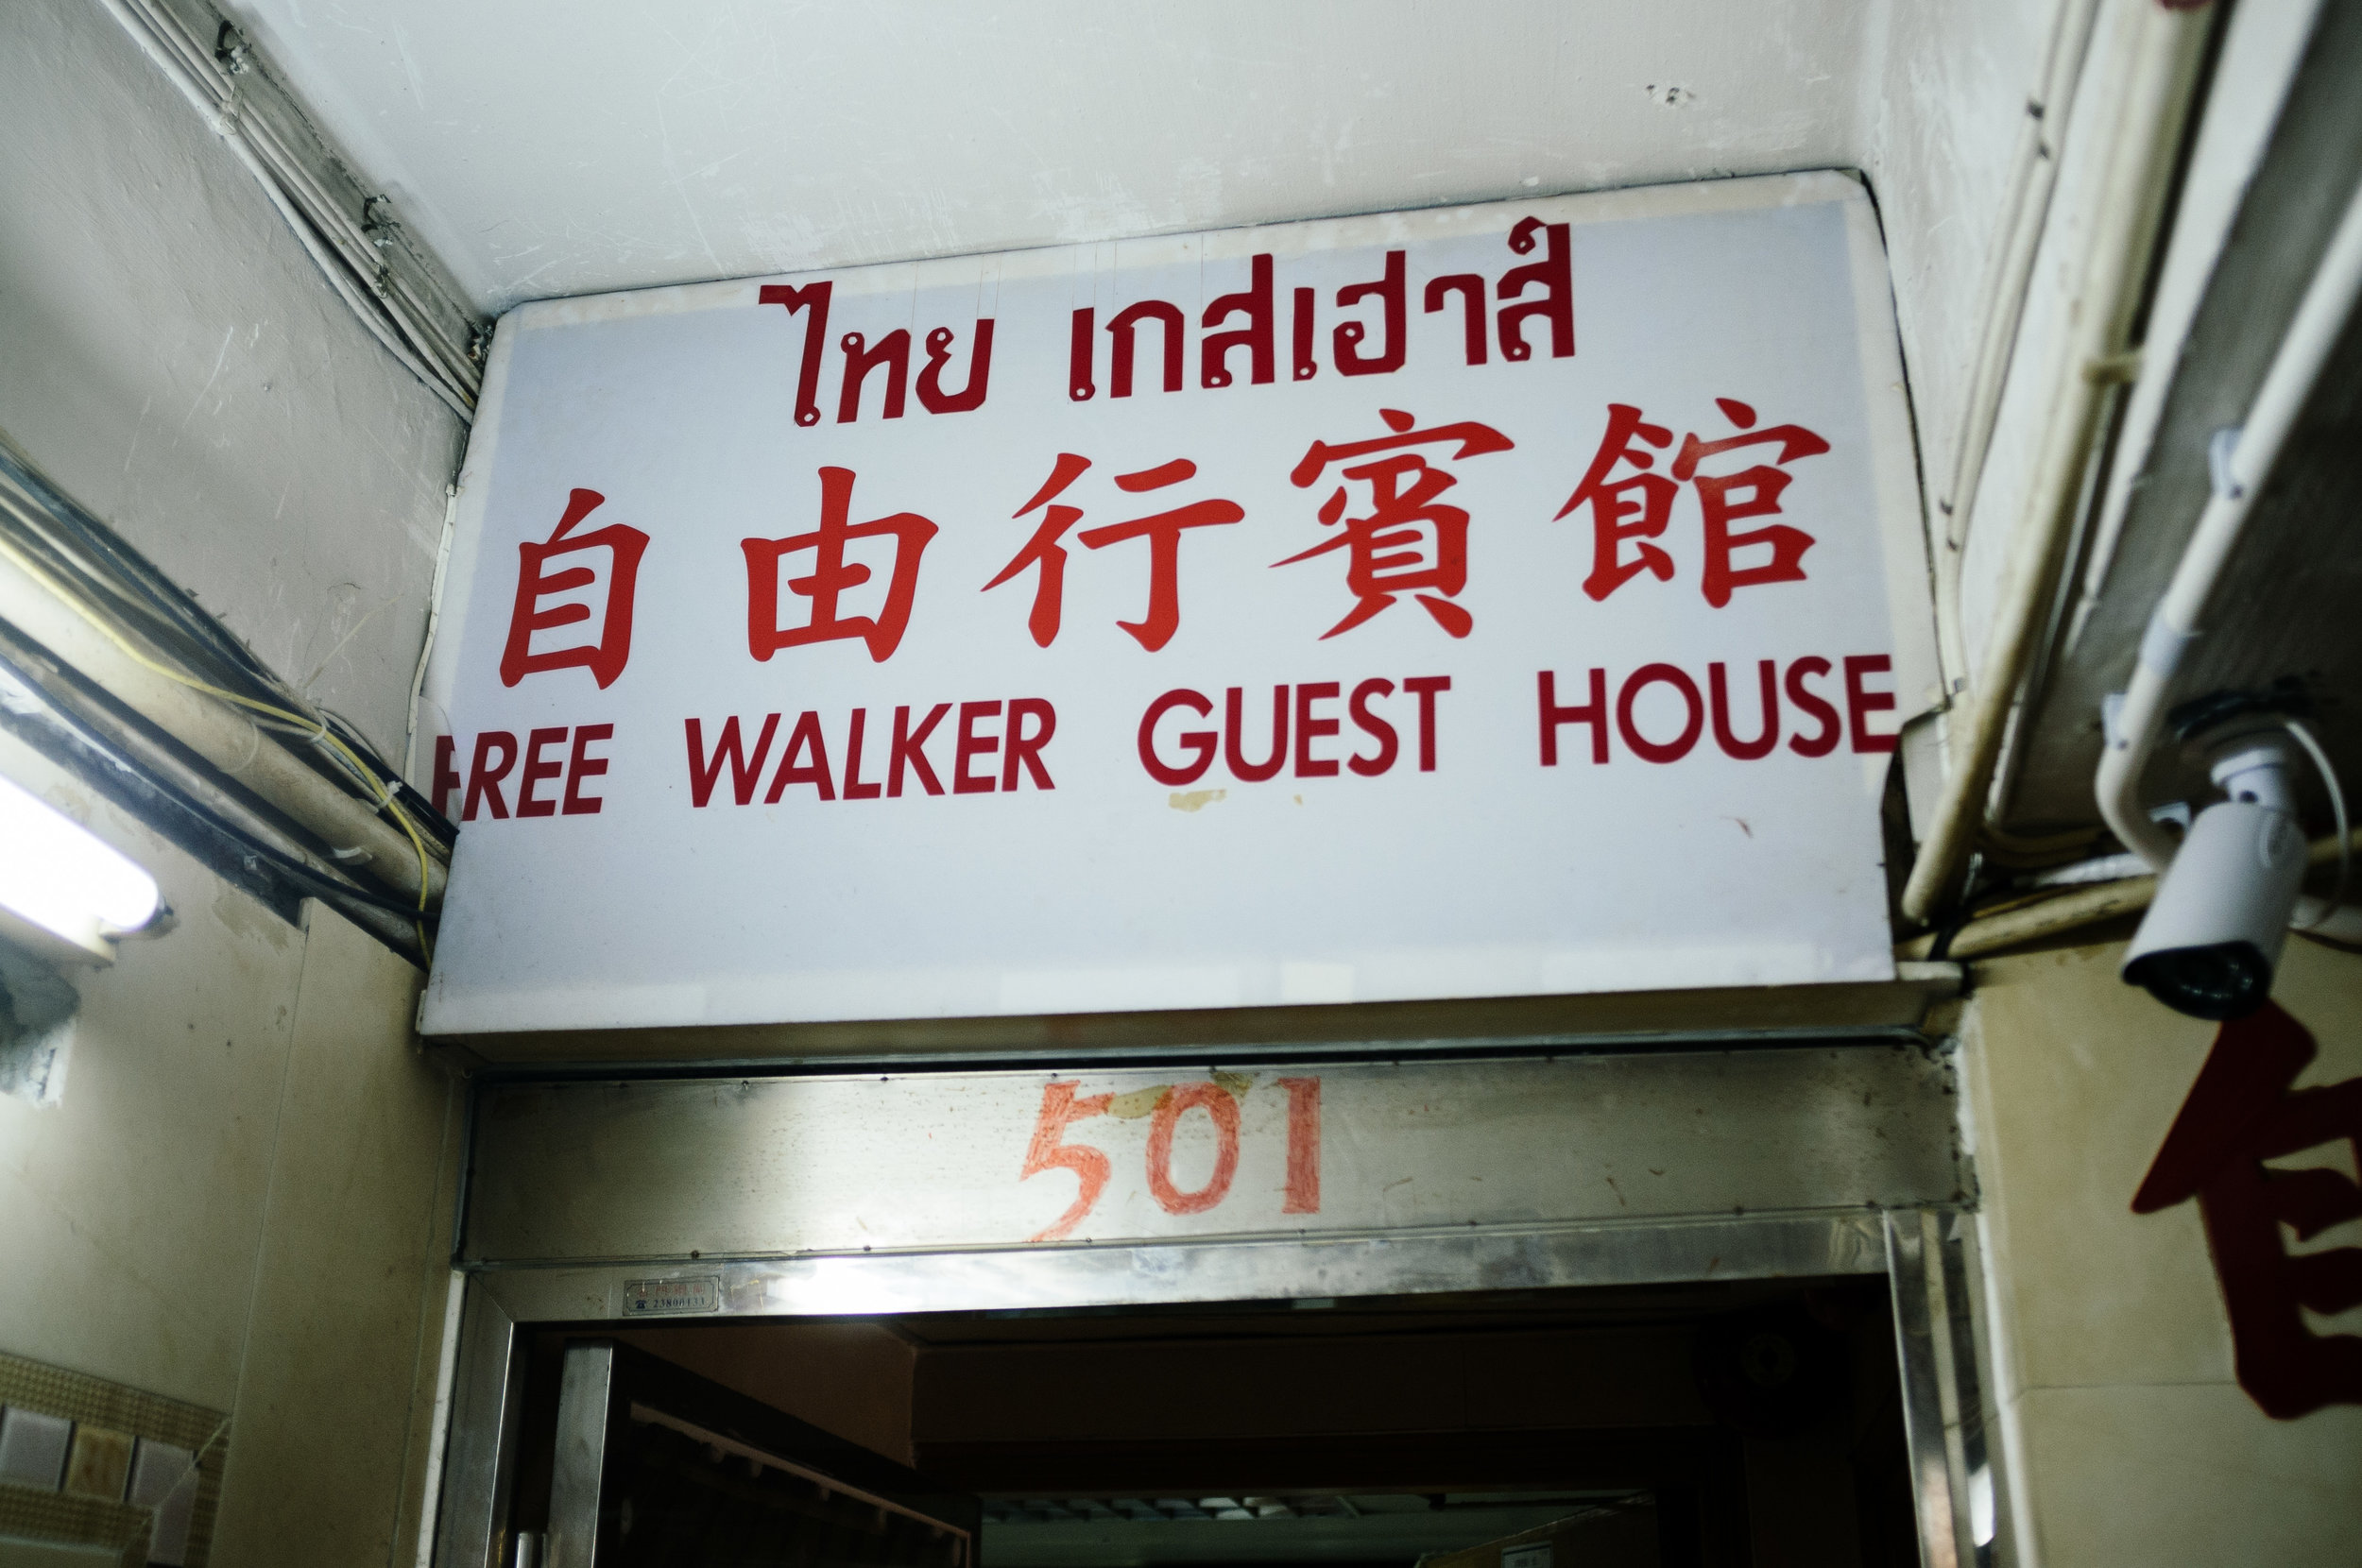 Mong Kok Free Walker.jpg